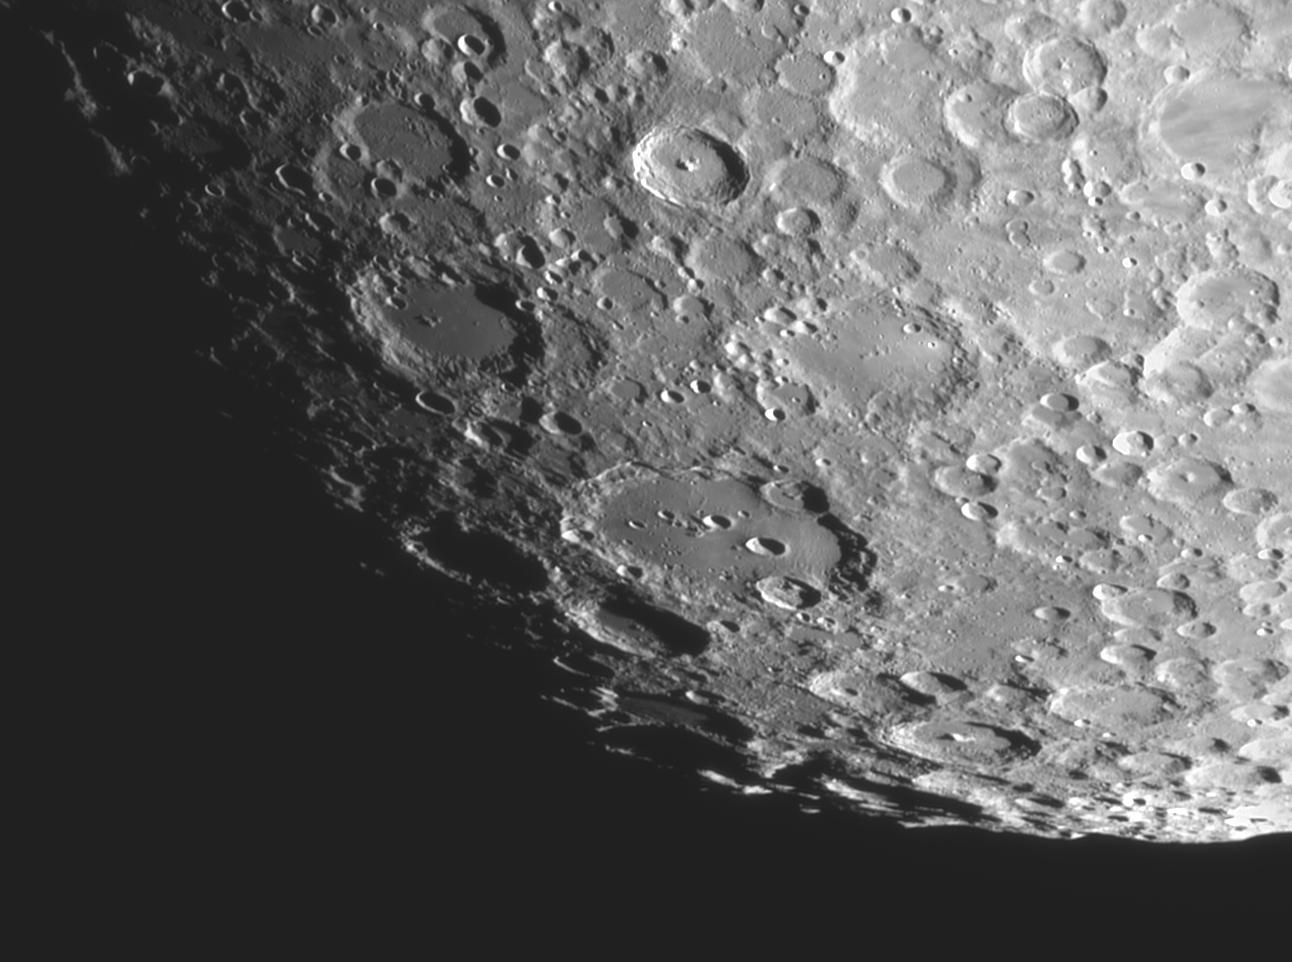 lune_28avril2015_20H08TU.jpg